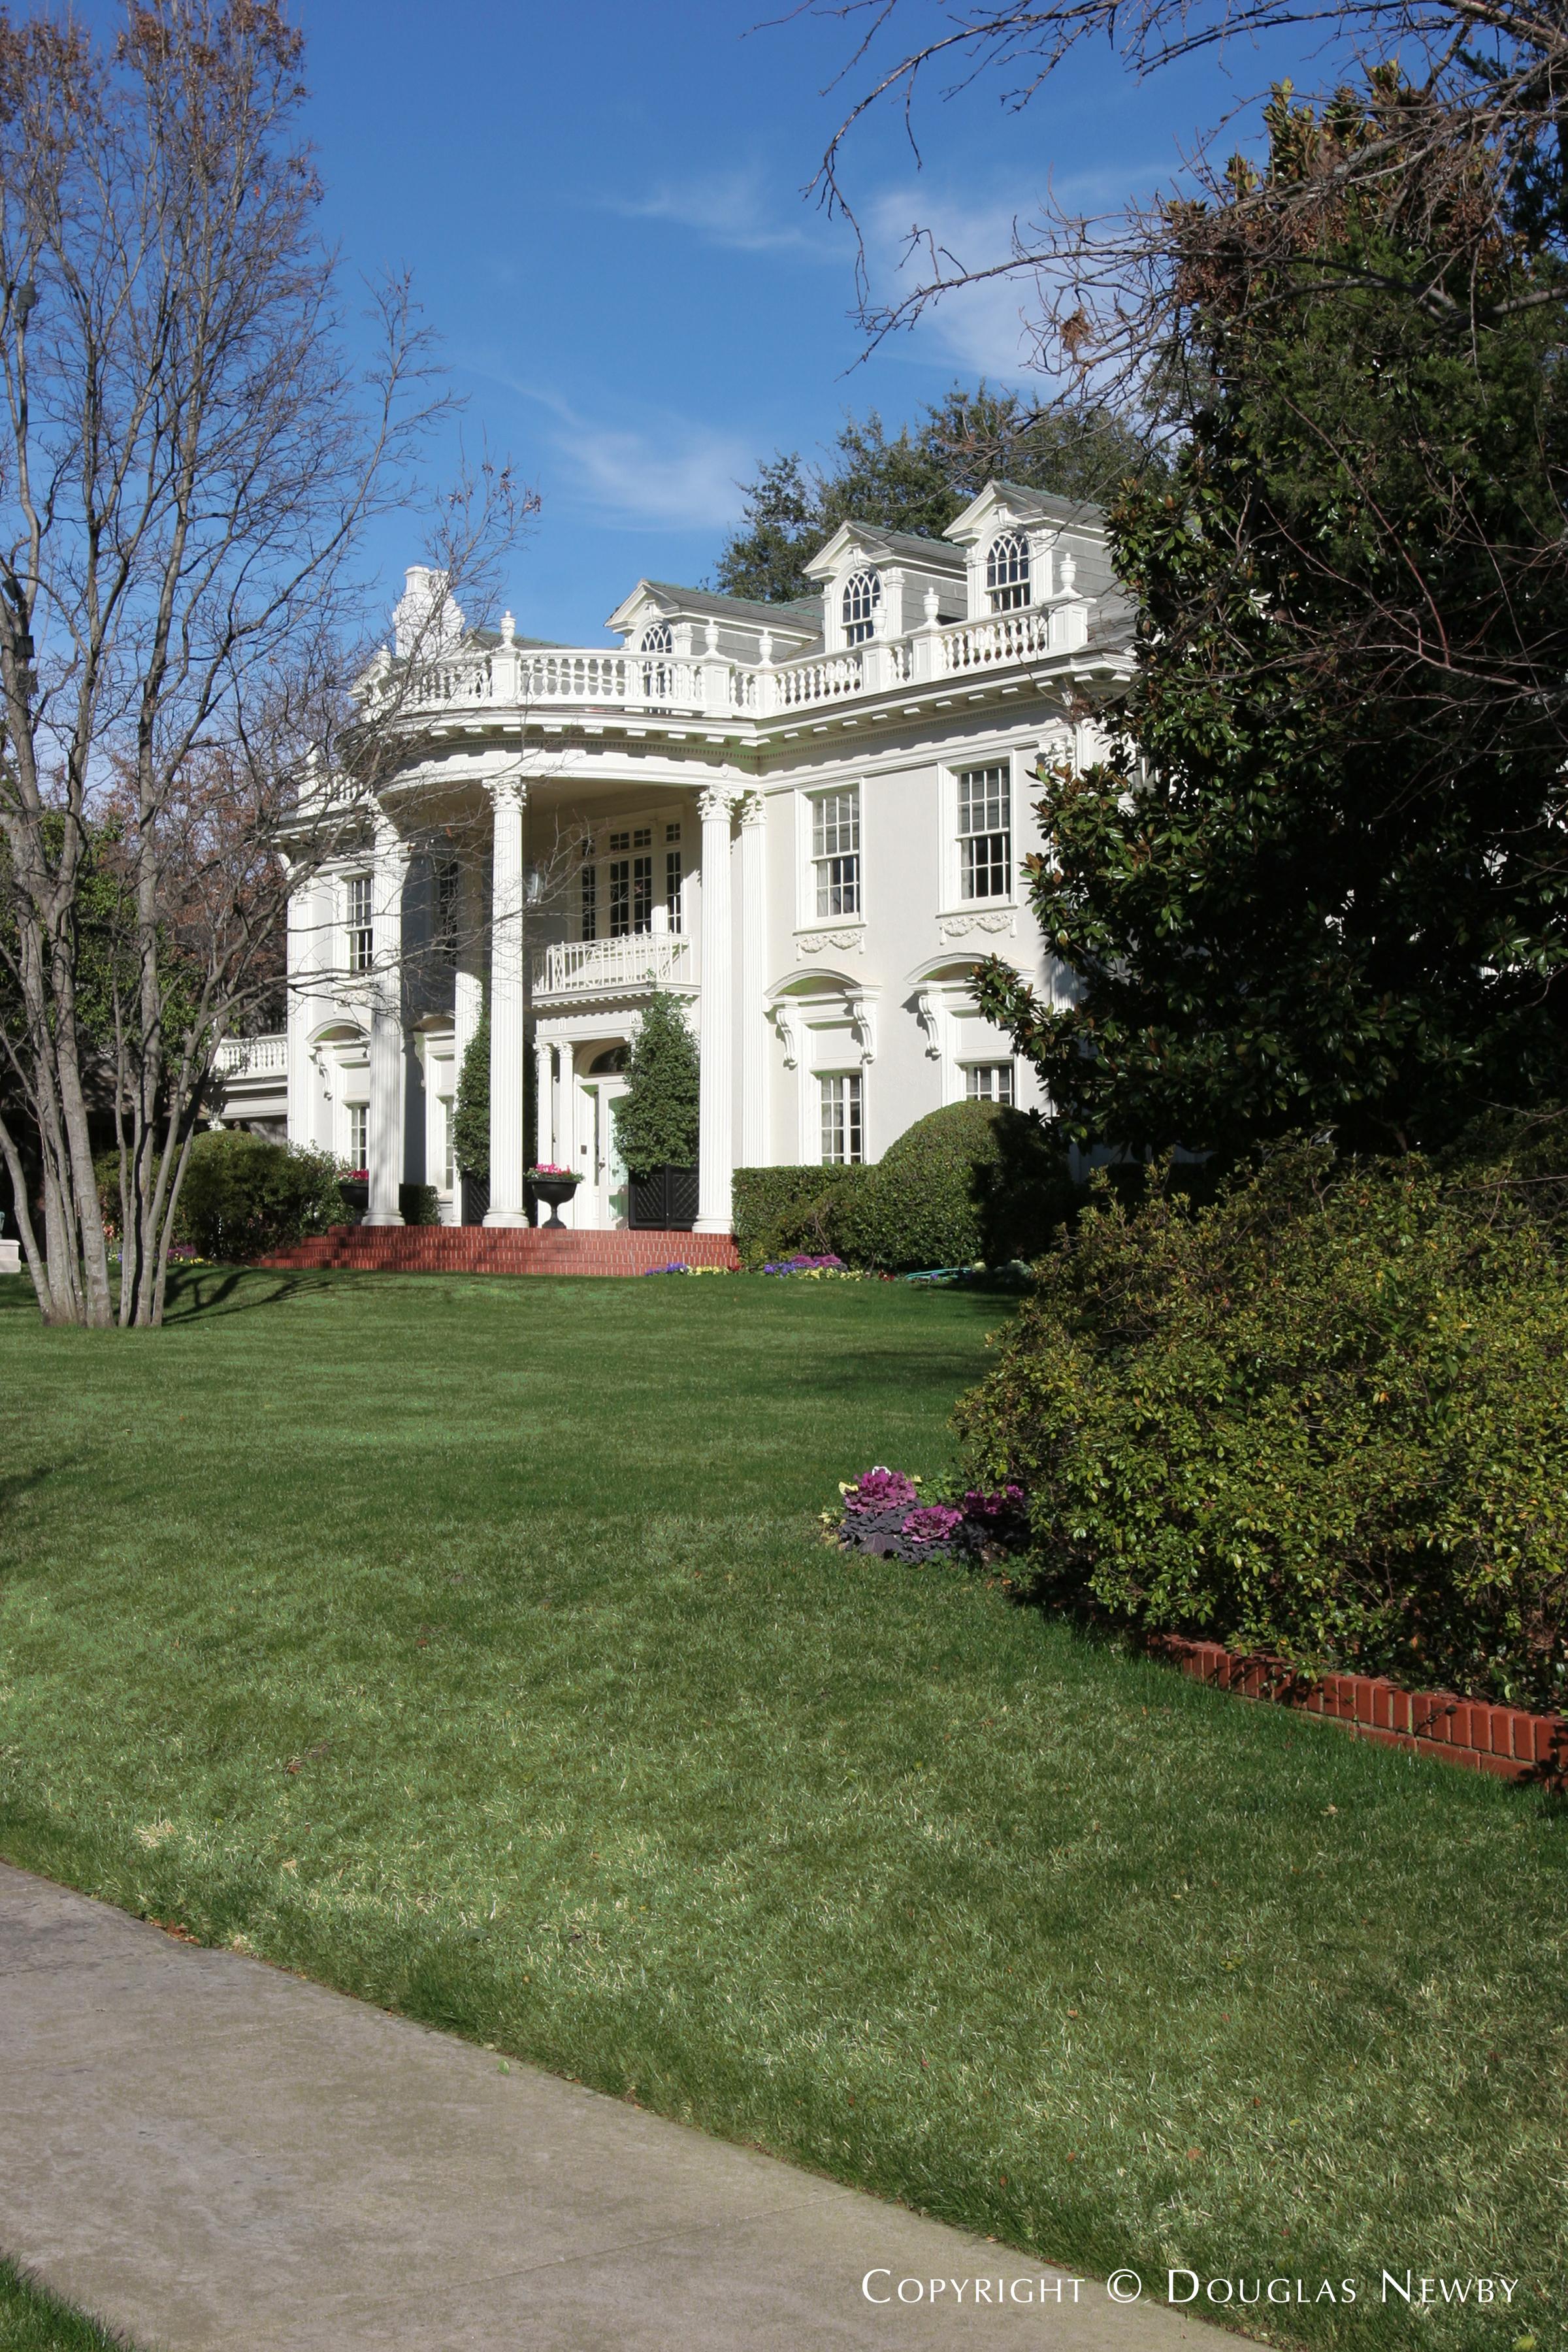 Highland Park Home sitting on 0.76 Acres